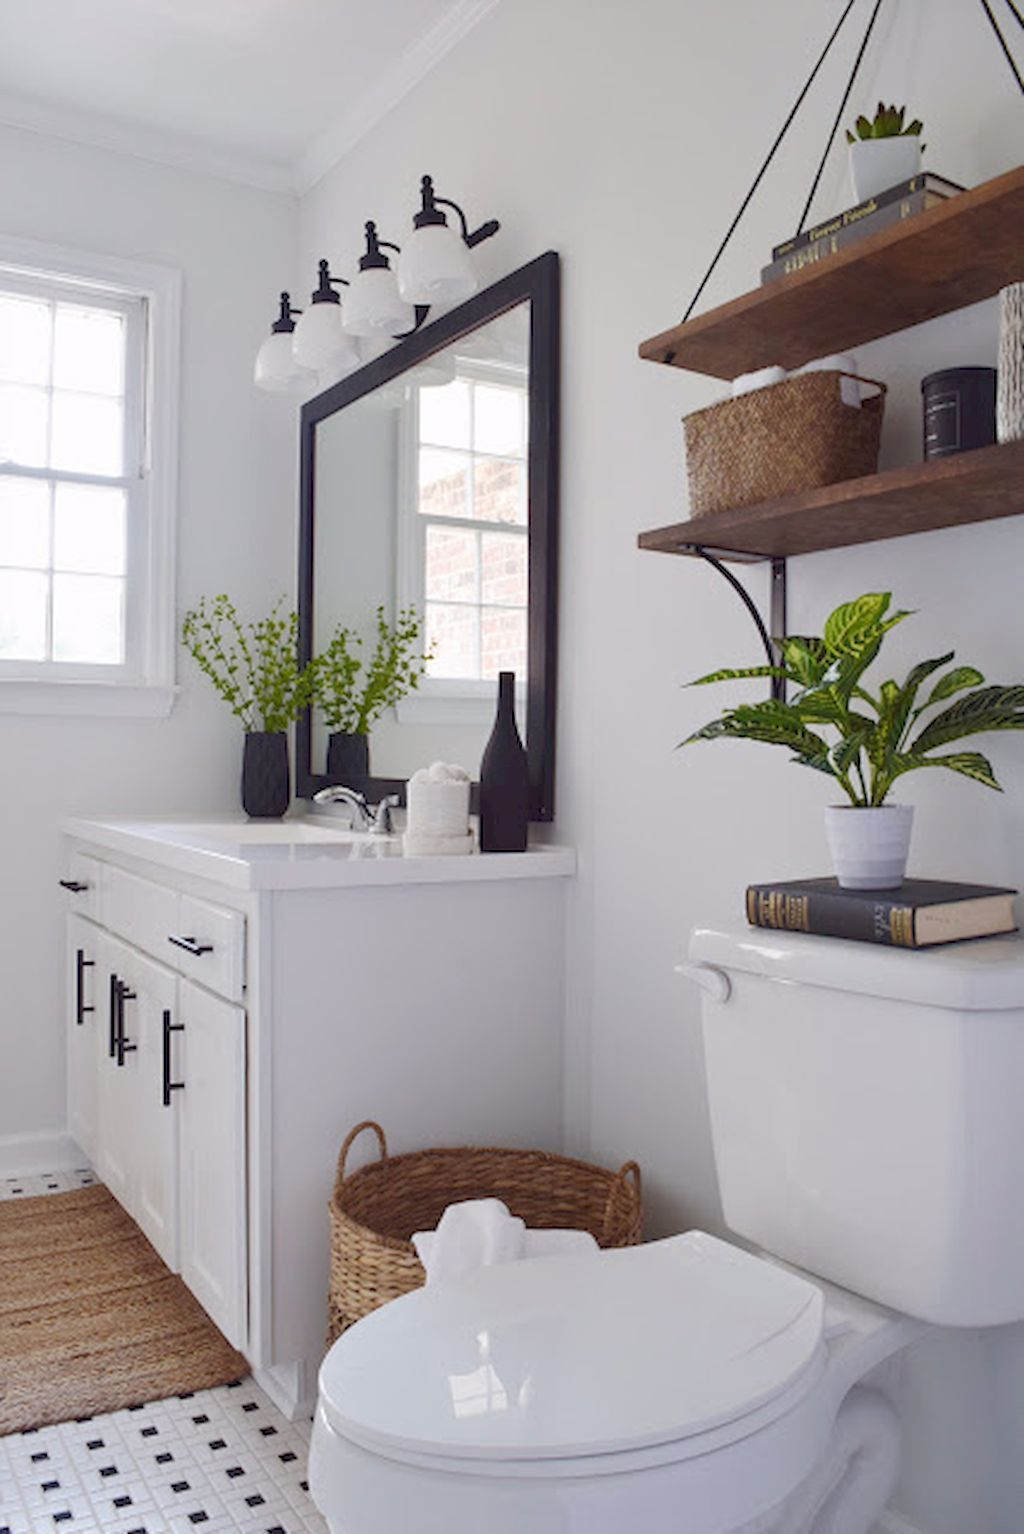 80 Vintage Farmhouse Bathroom Remodel Ideas on